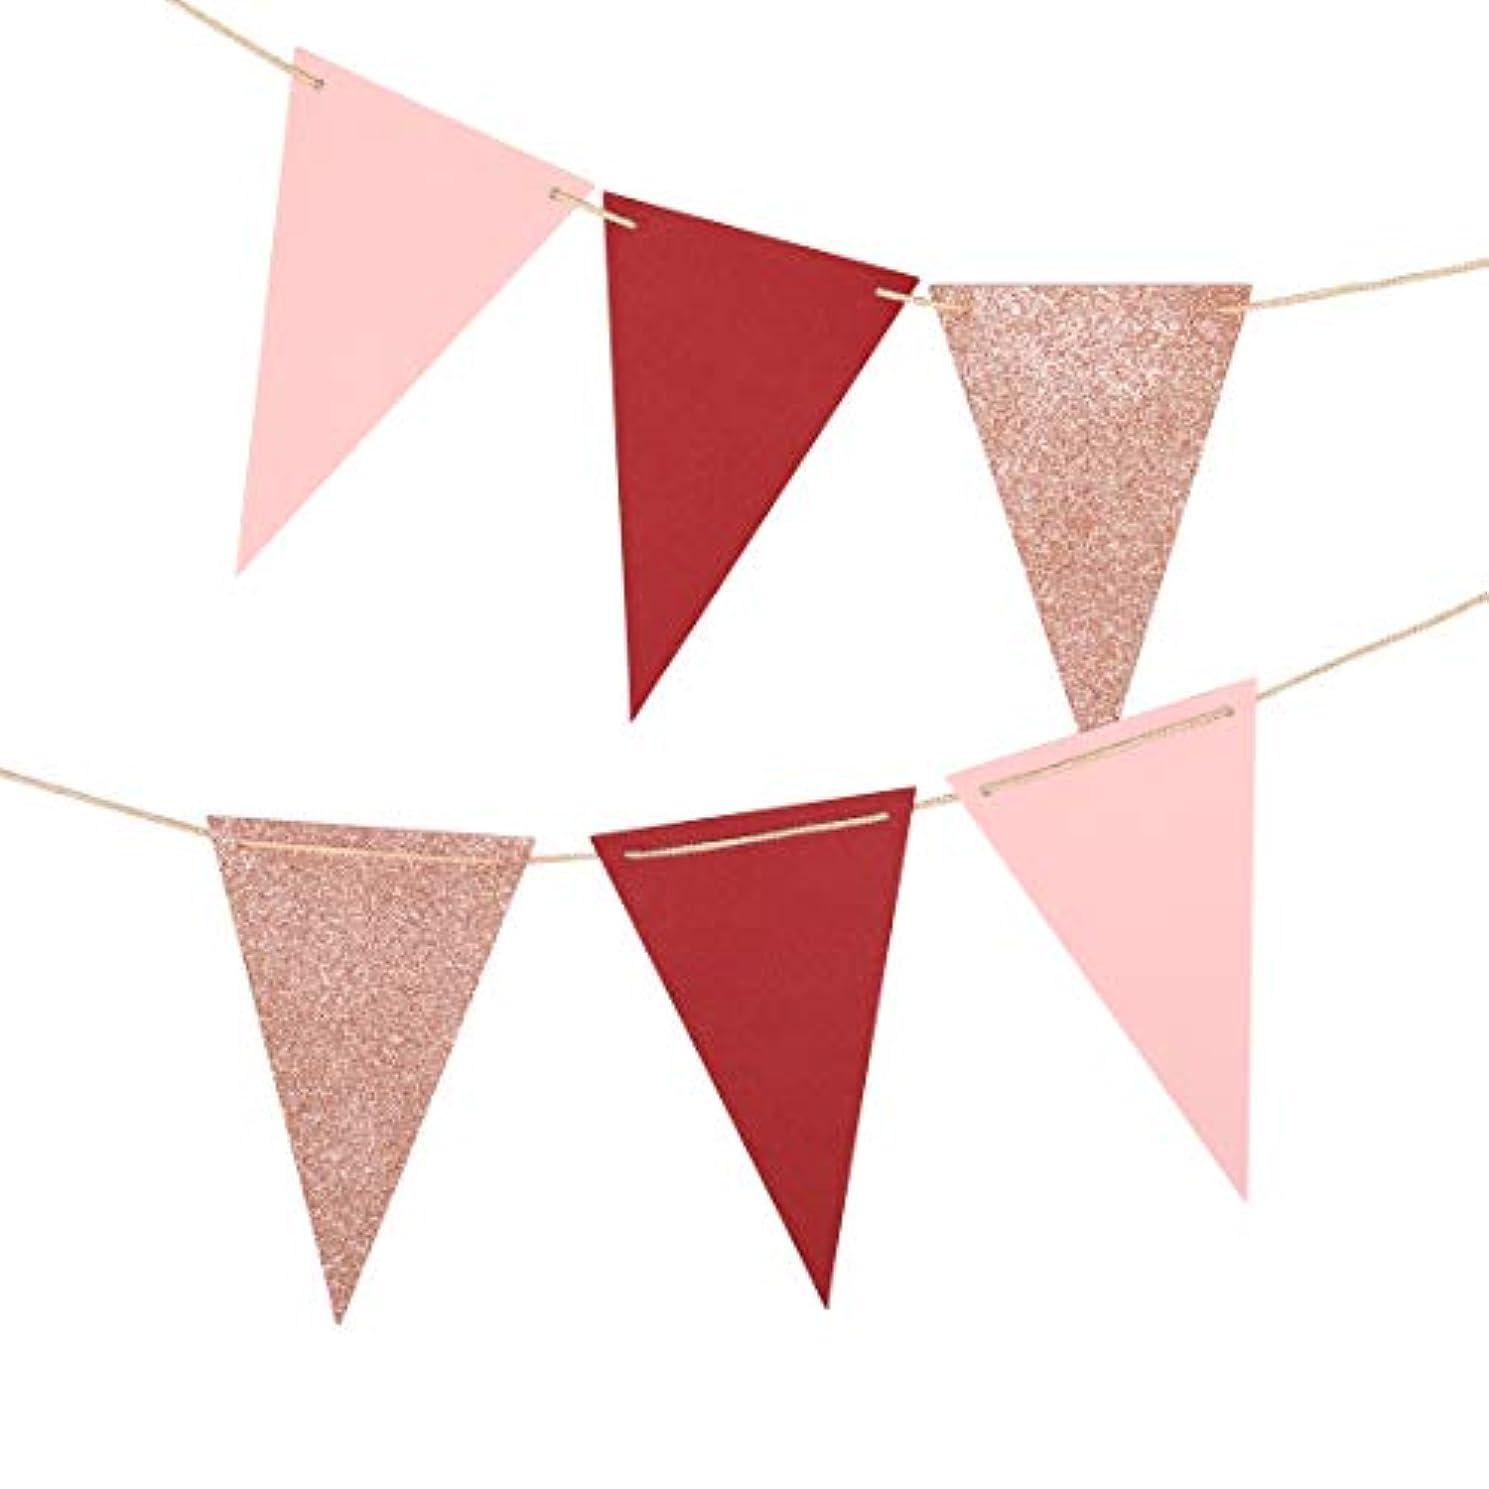 Fonder Mols Paper Pennant Decorations,Triangle Flags Bunting Garland for Wedding, Nursery, Baby Shower, Bridal Shower, Bachelorette Decor(10 feet, Rose Gold/Burgundy/Blush Pink)